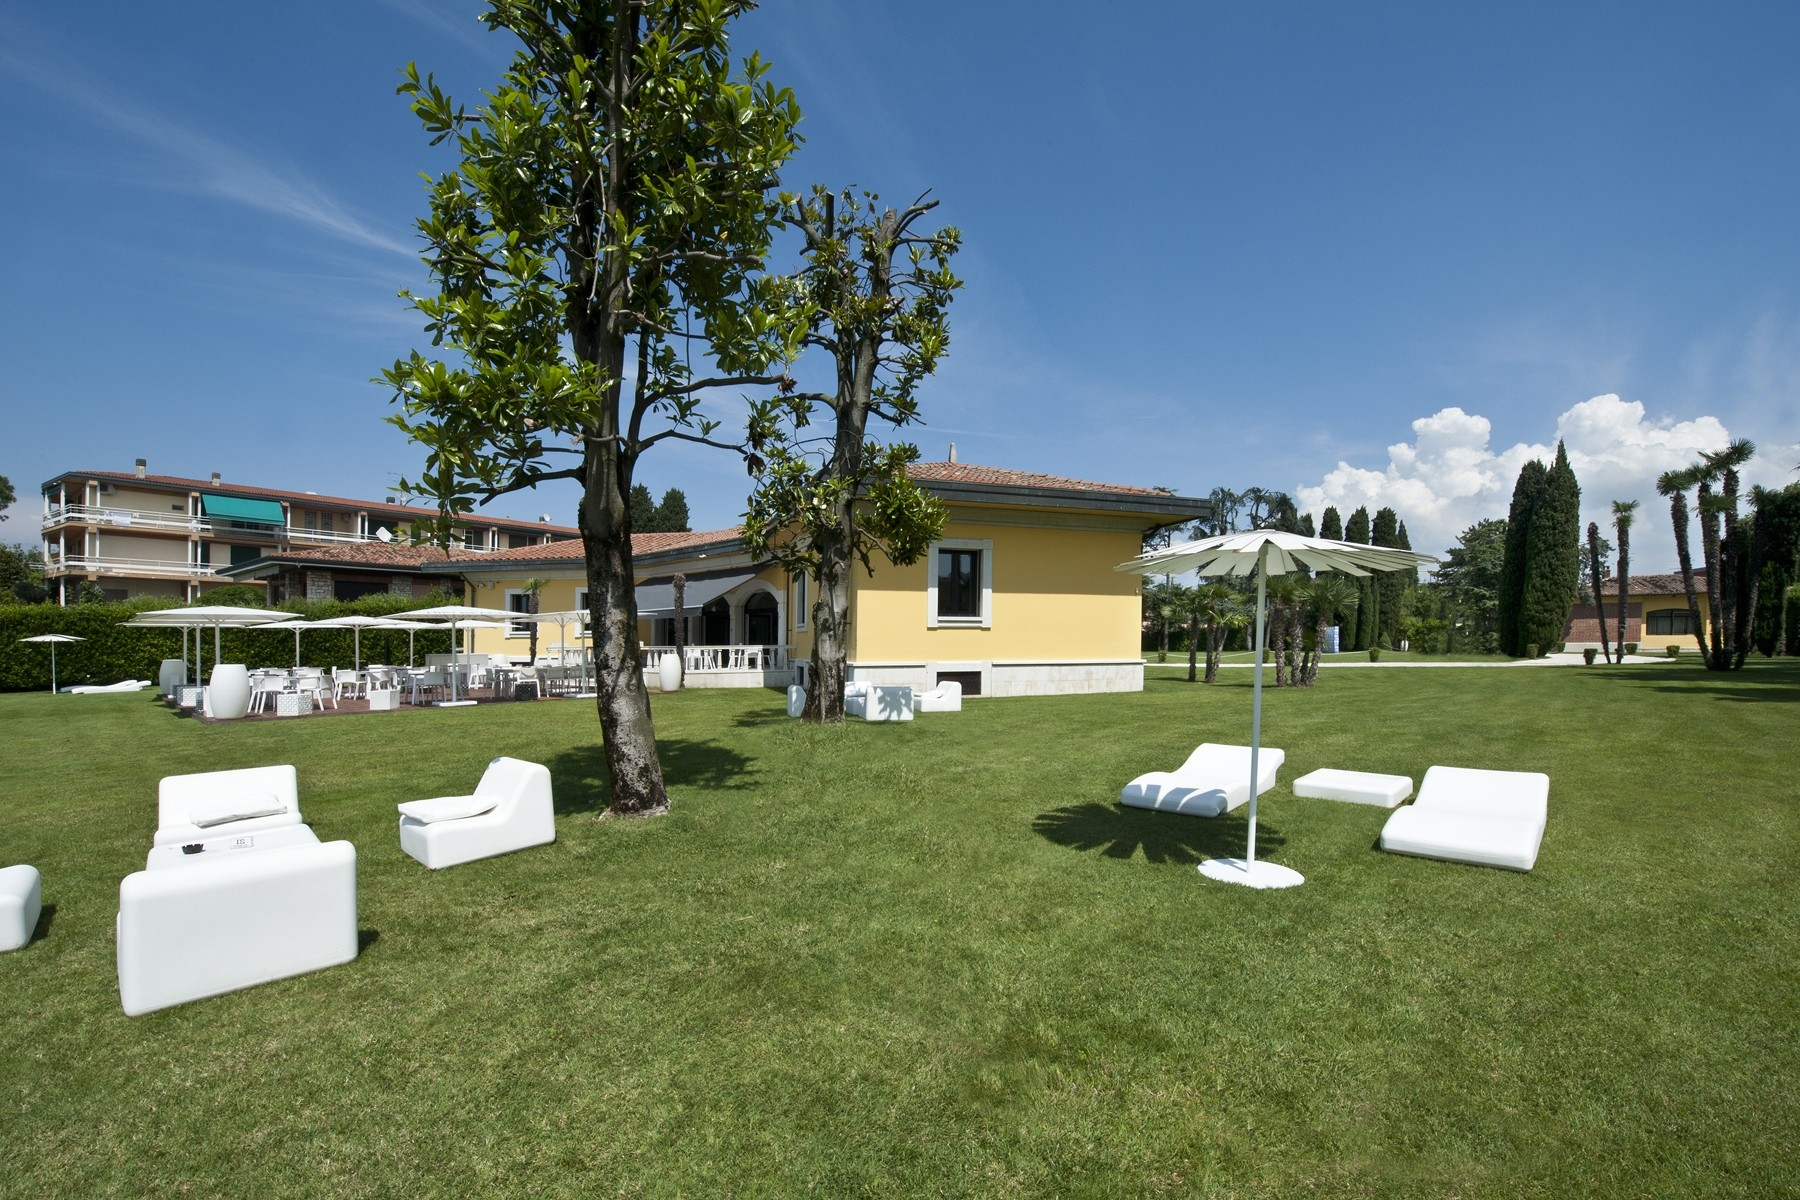 Villa in Vendita a Sirmione: 5 locali, 550 mq - Foto 9